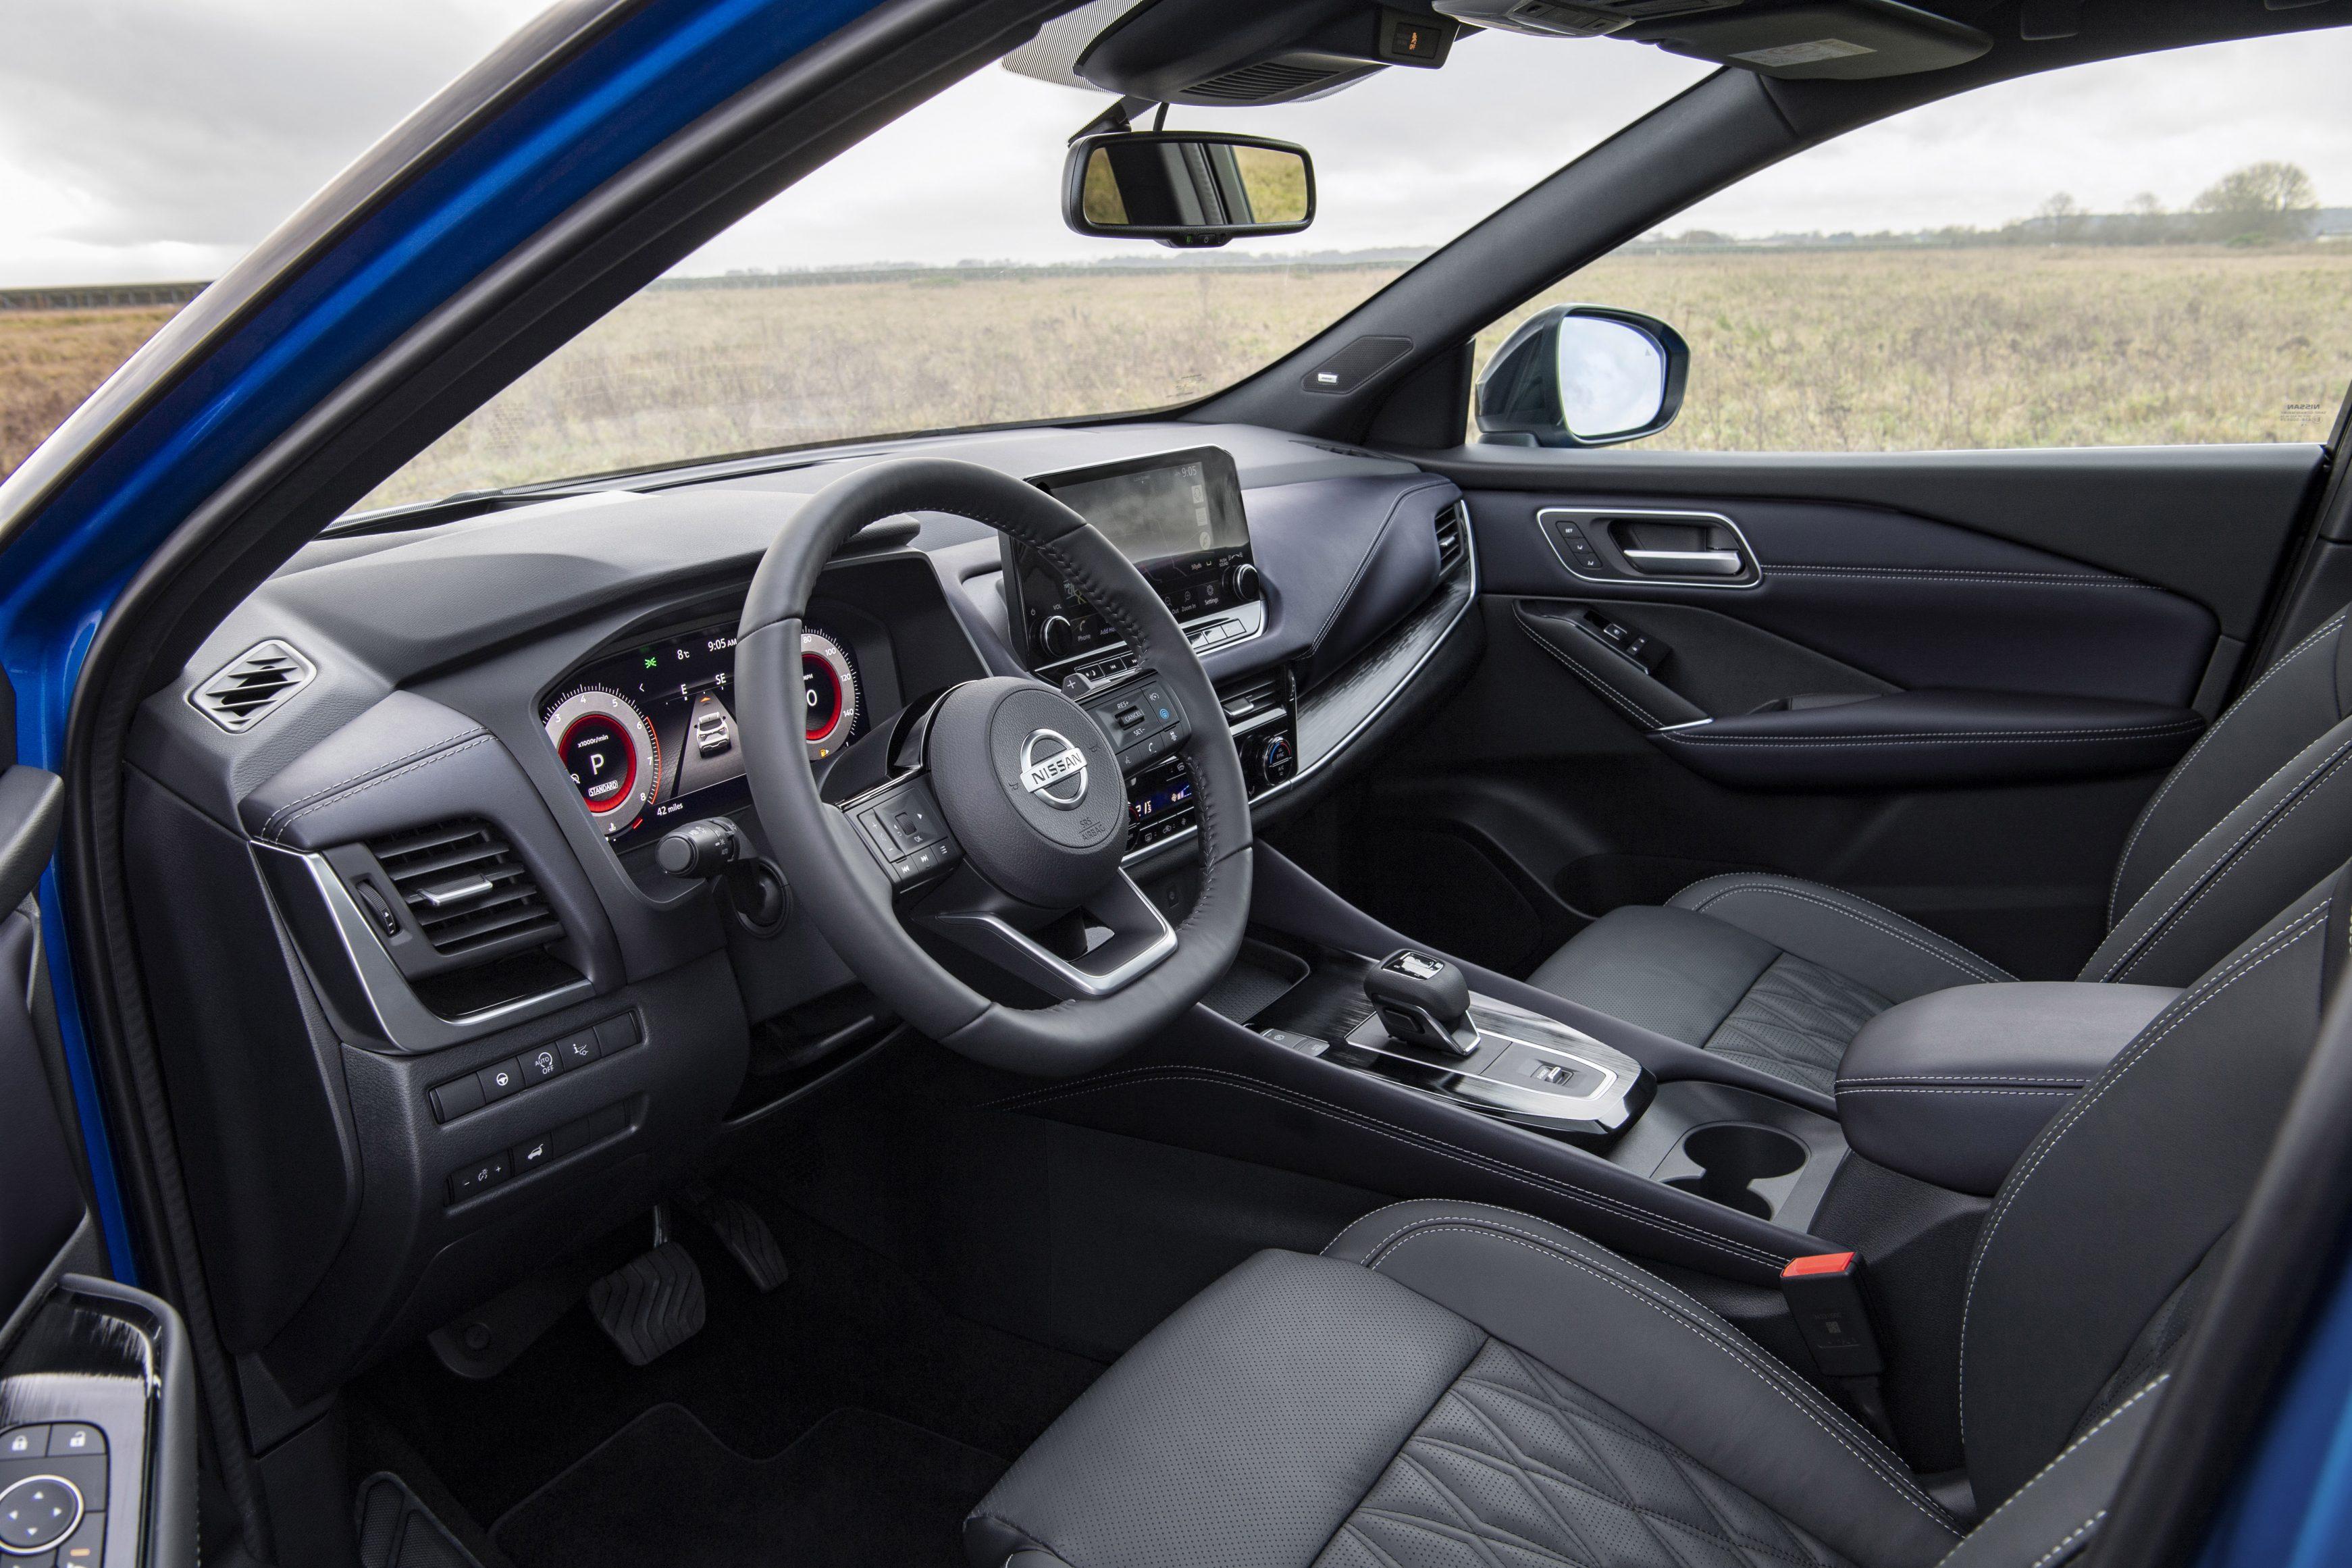 All-new 2021 Nissan Qashqai interior